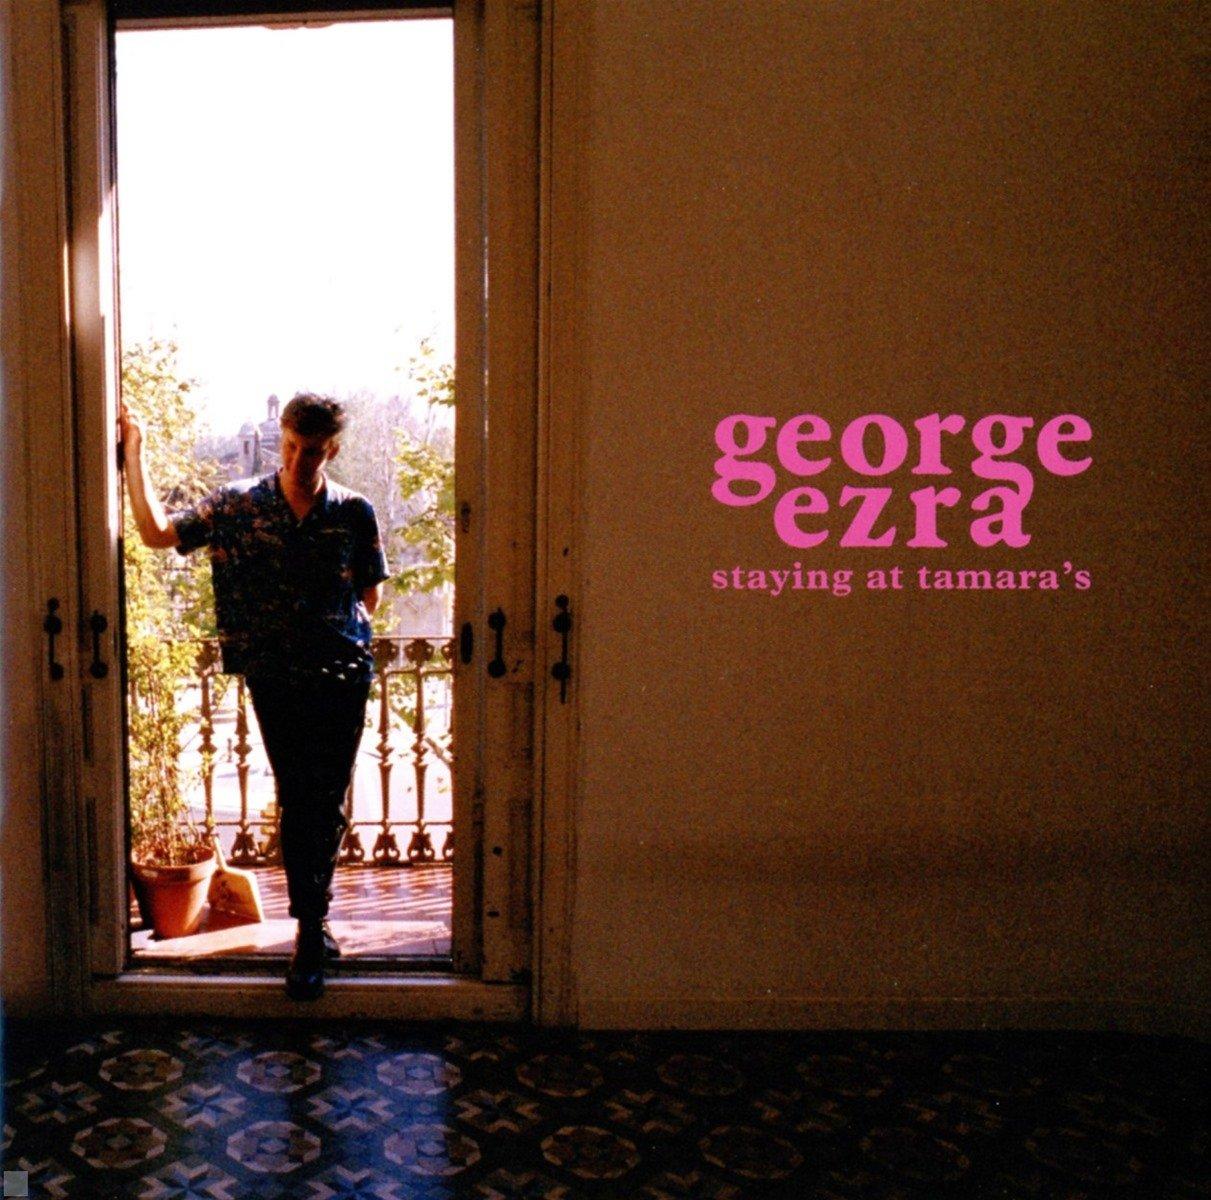 George Ezra - Staying At Tamara's CD now £5 (Prime) + 99p P&P (non Prime) at Amazon